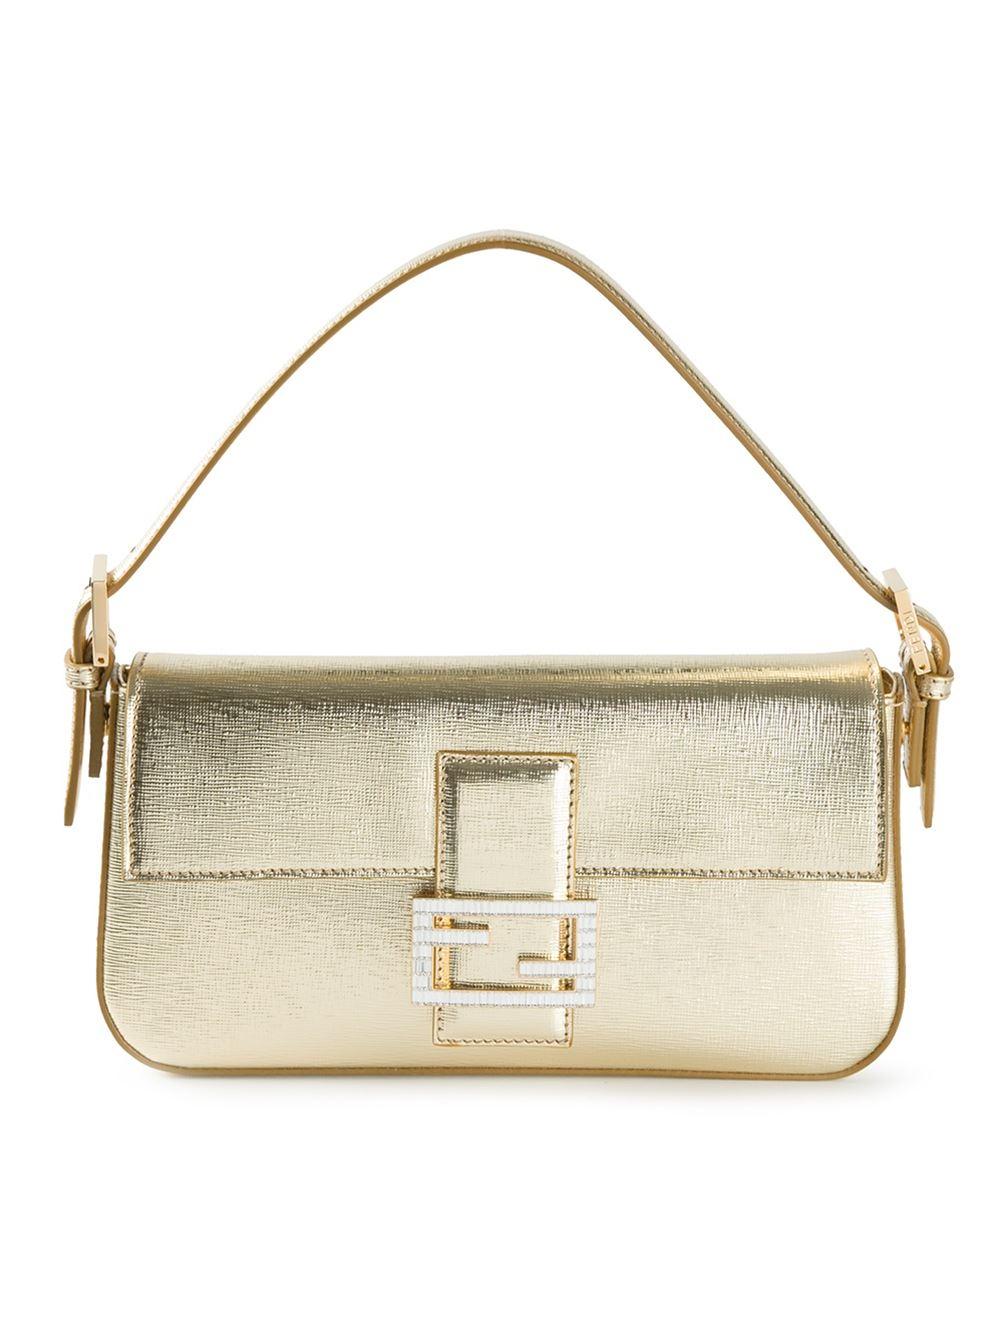 Fendi Baguette Leather Shoulder Bag in Metallic